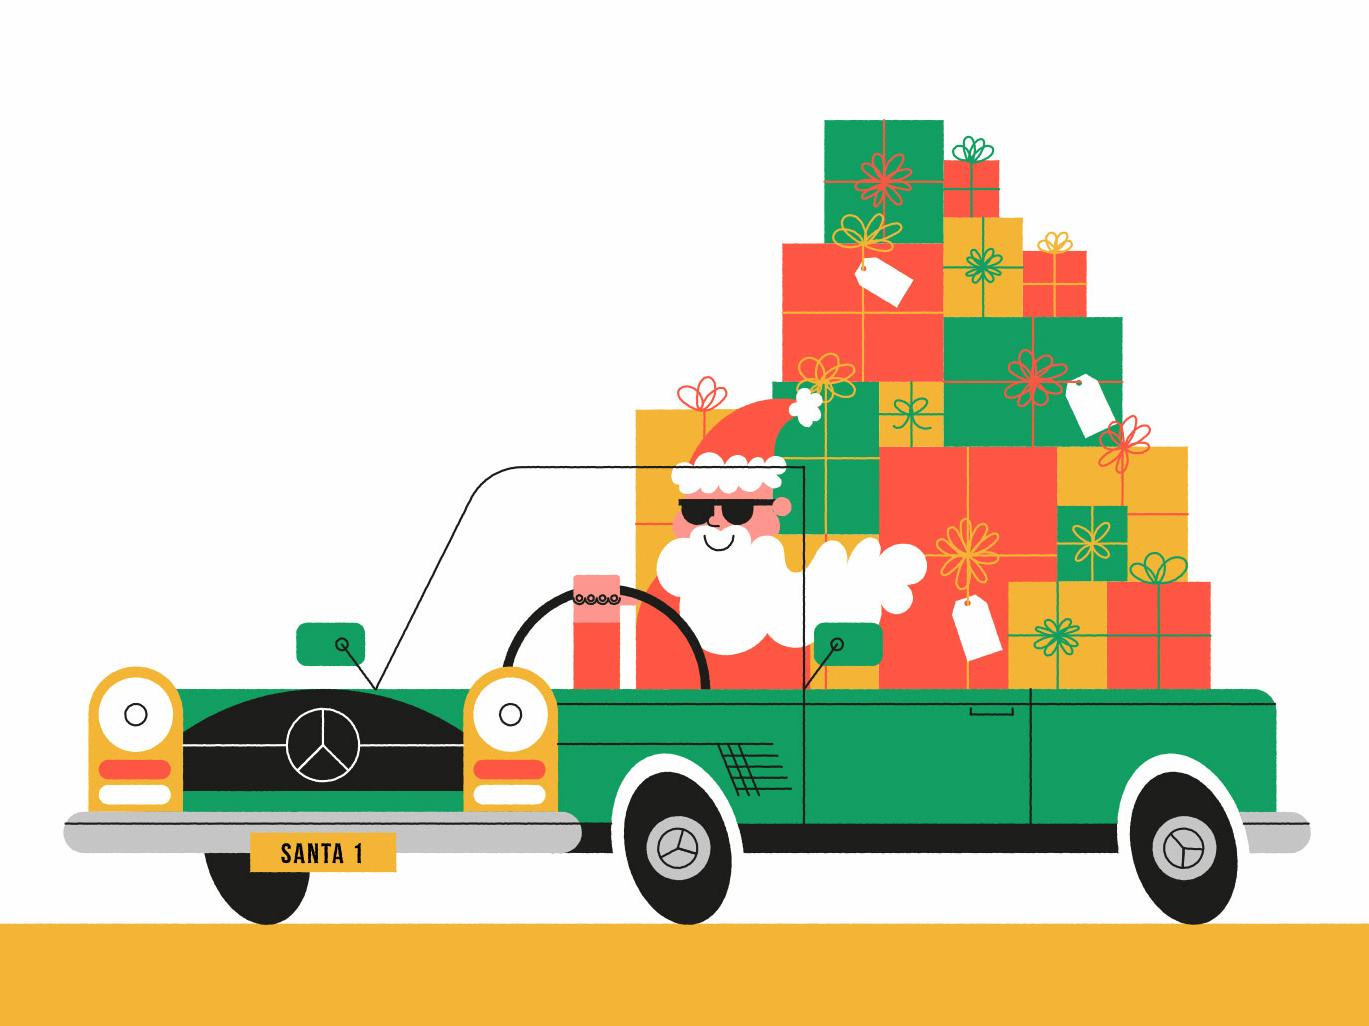 Santa christmas john devolle humour car santa character folioart vector digital illustration